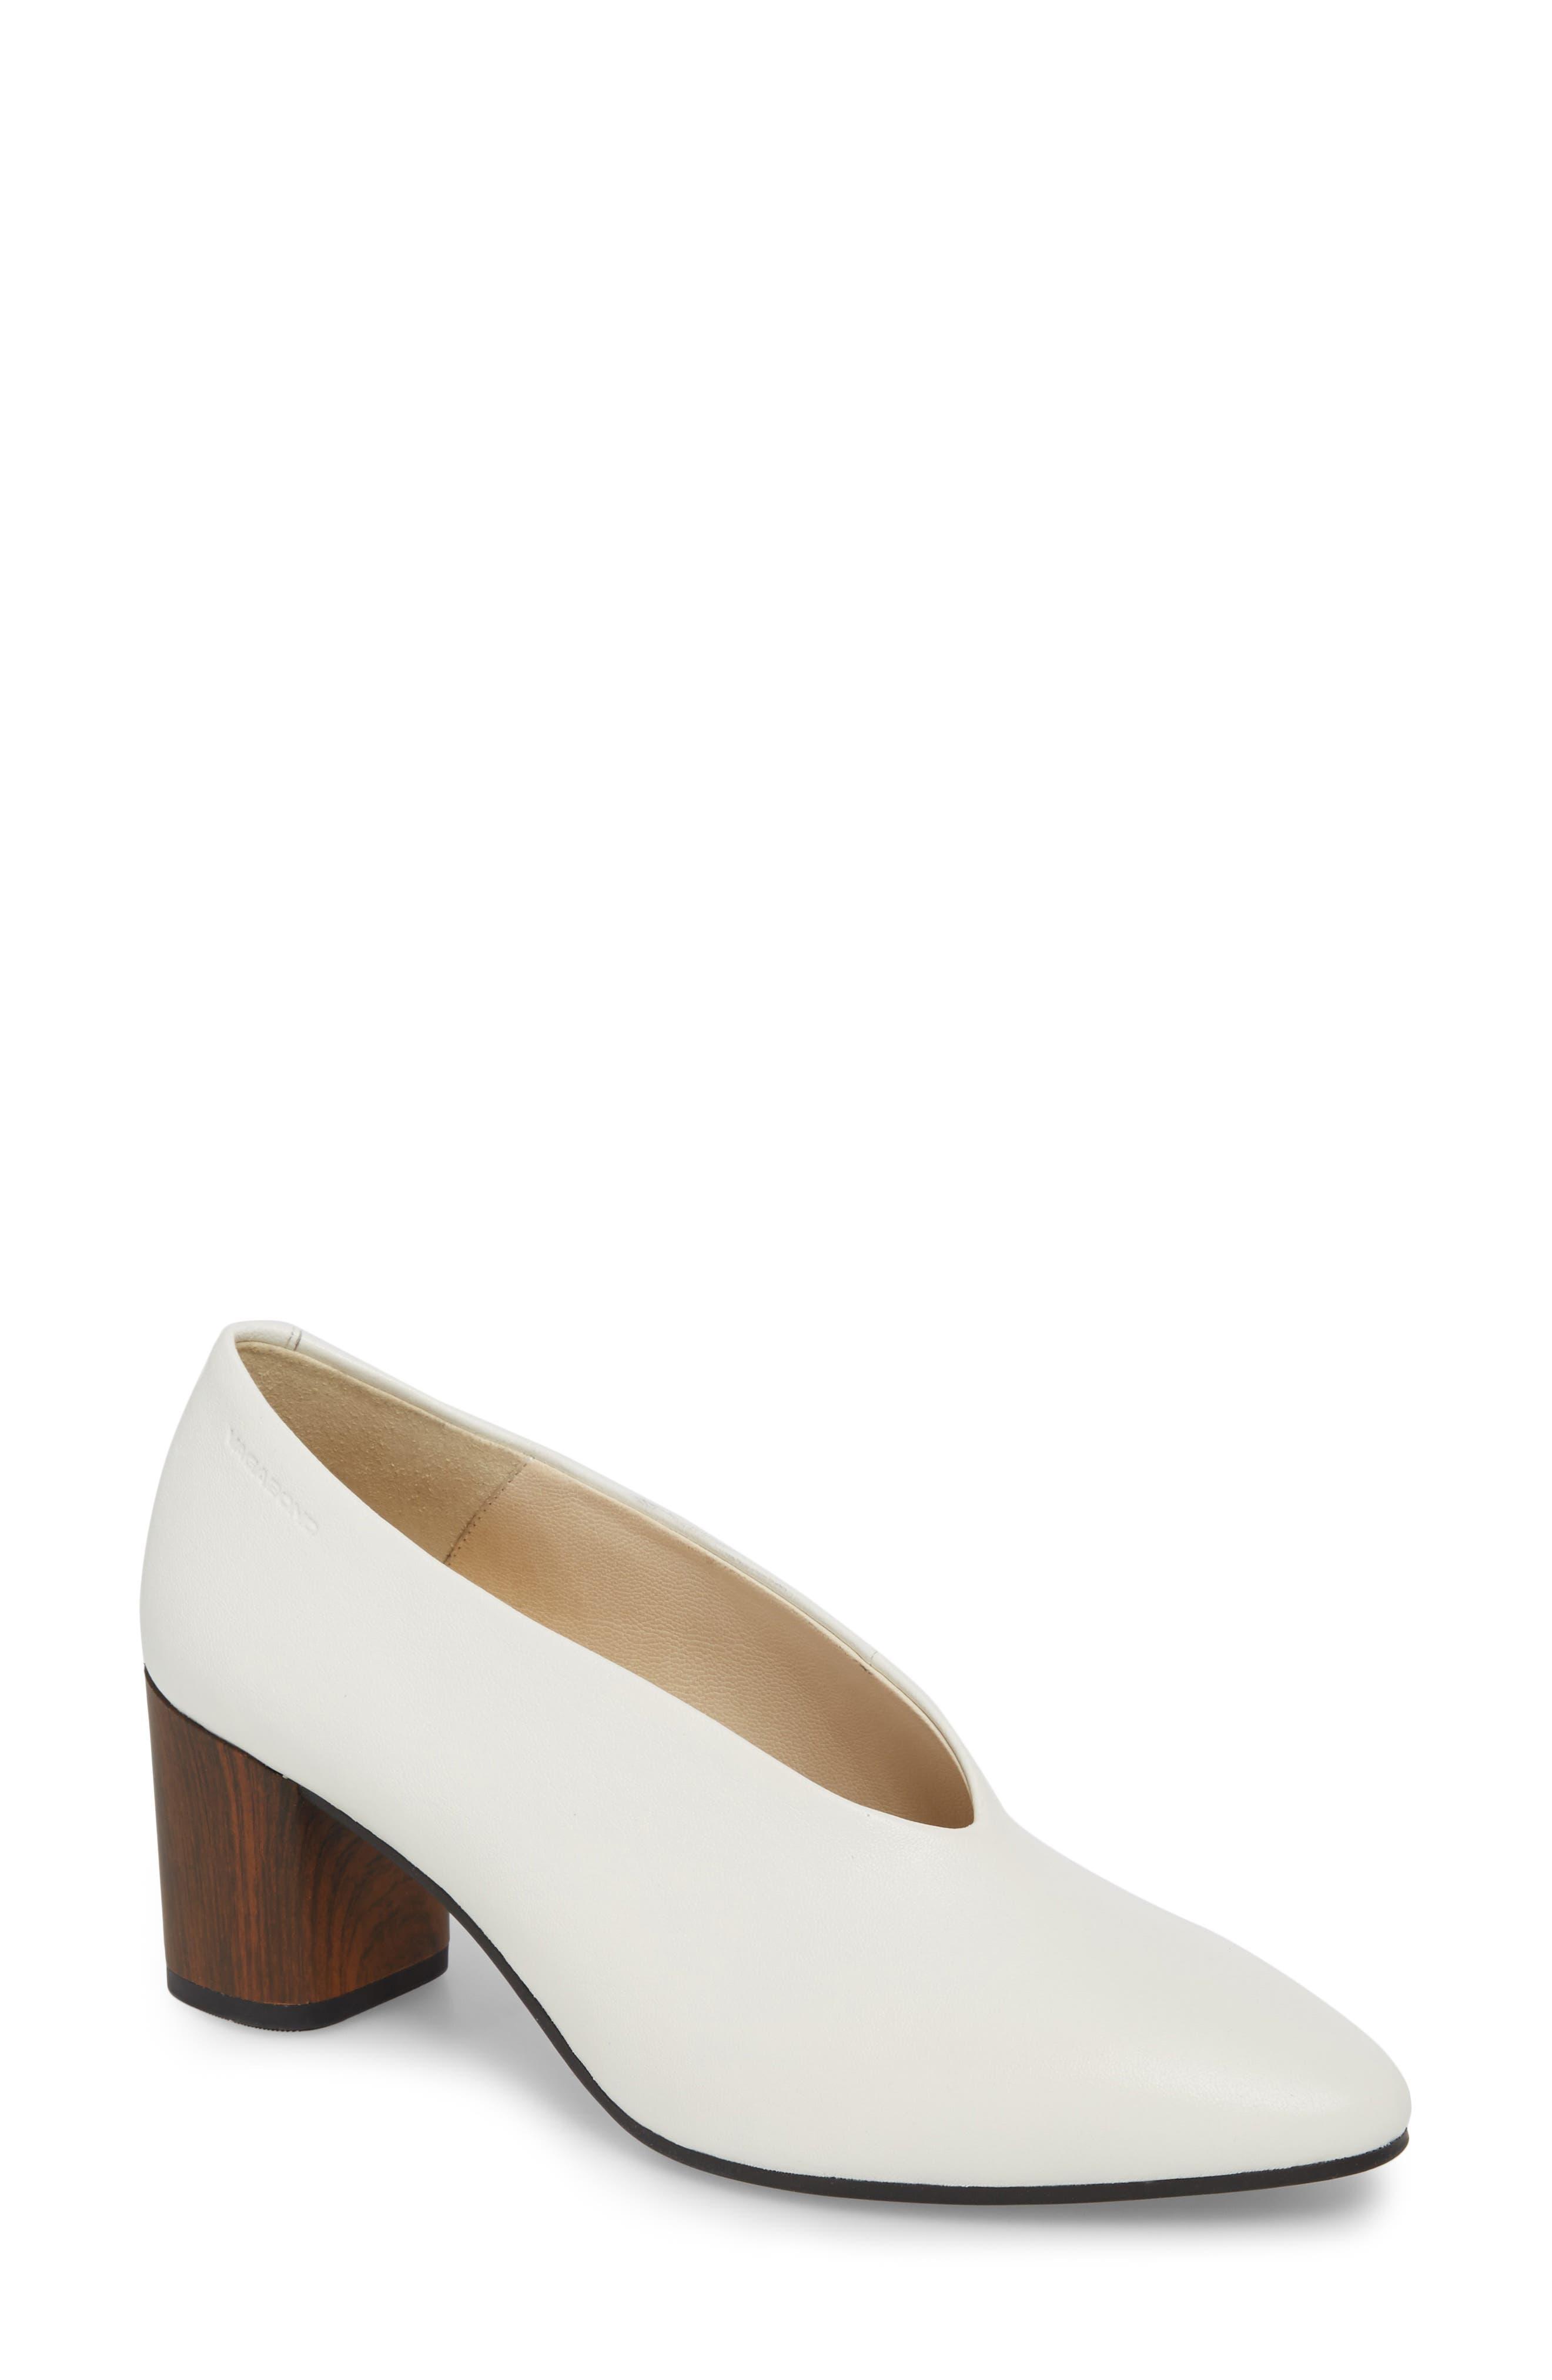 Eve Pump,                         Main,                         color, Cream White Leather